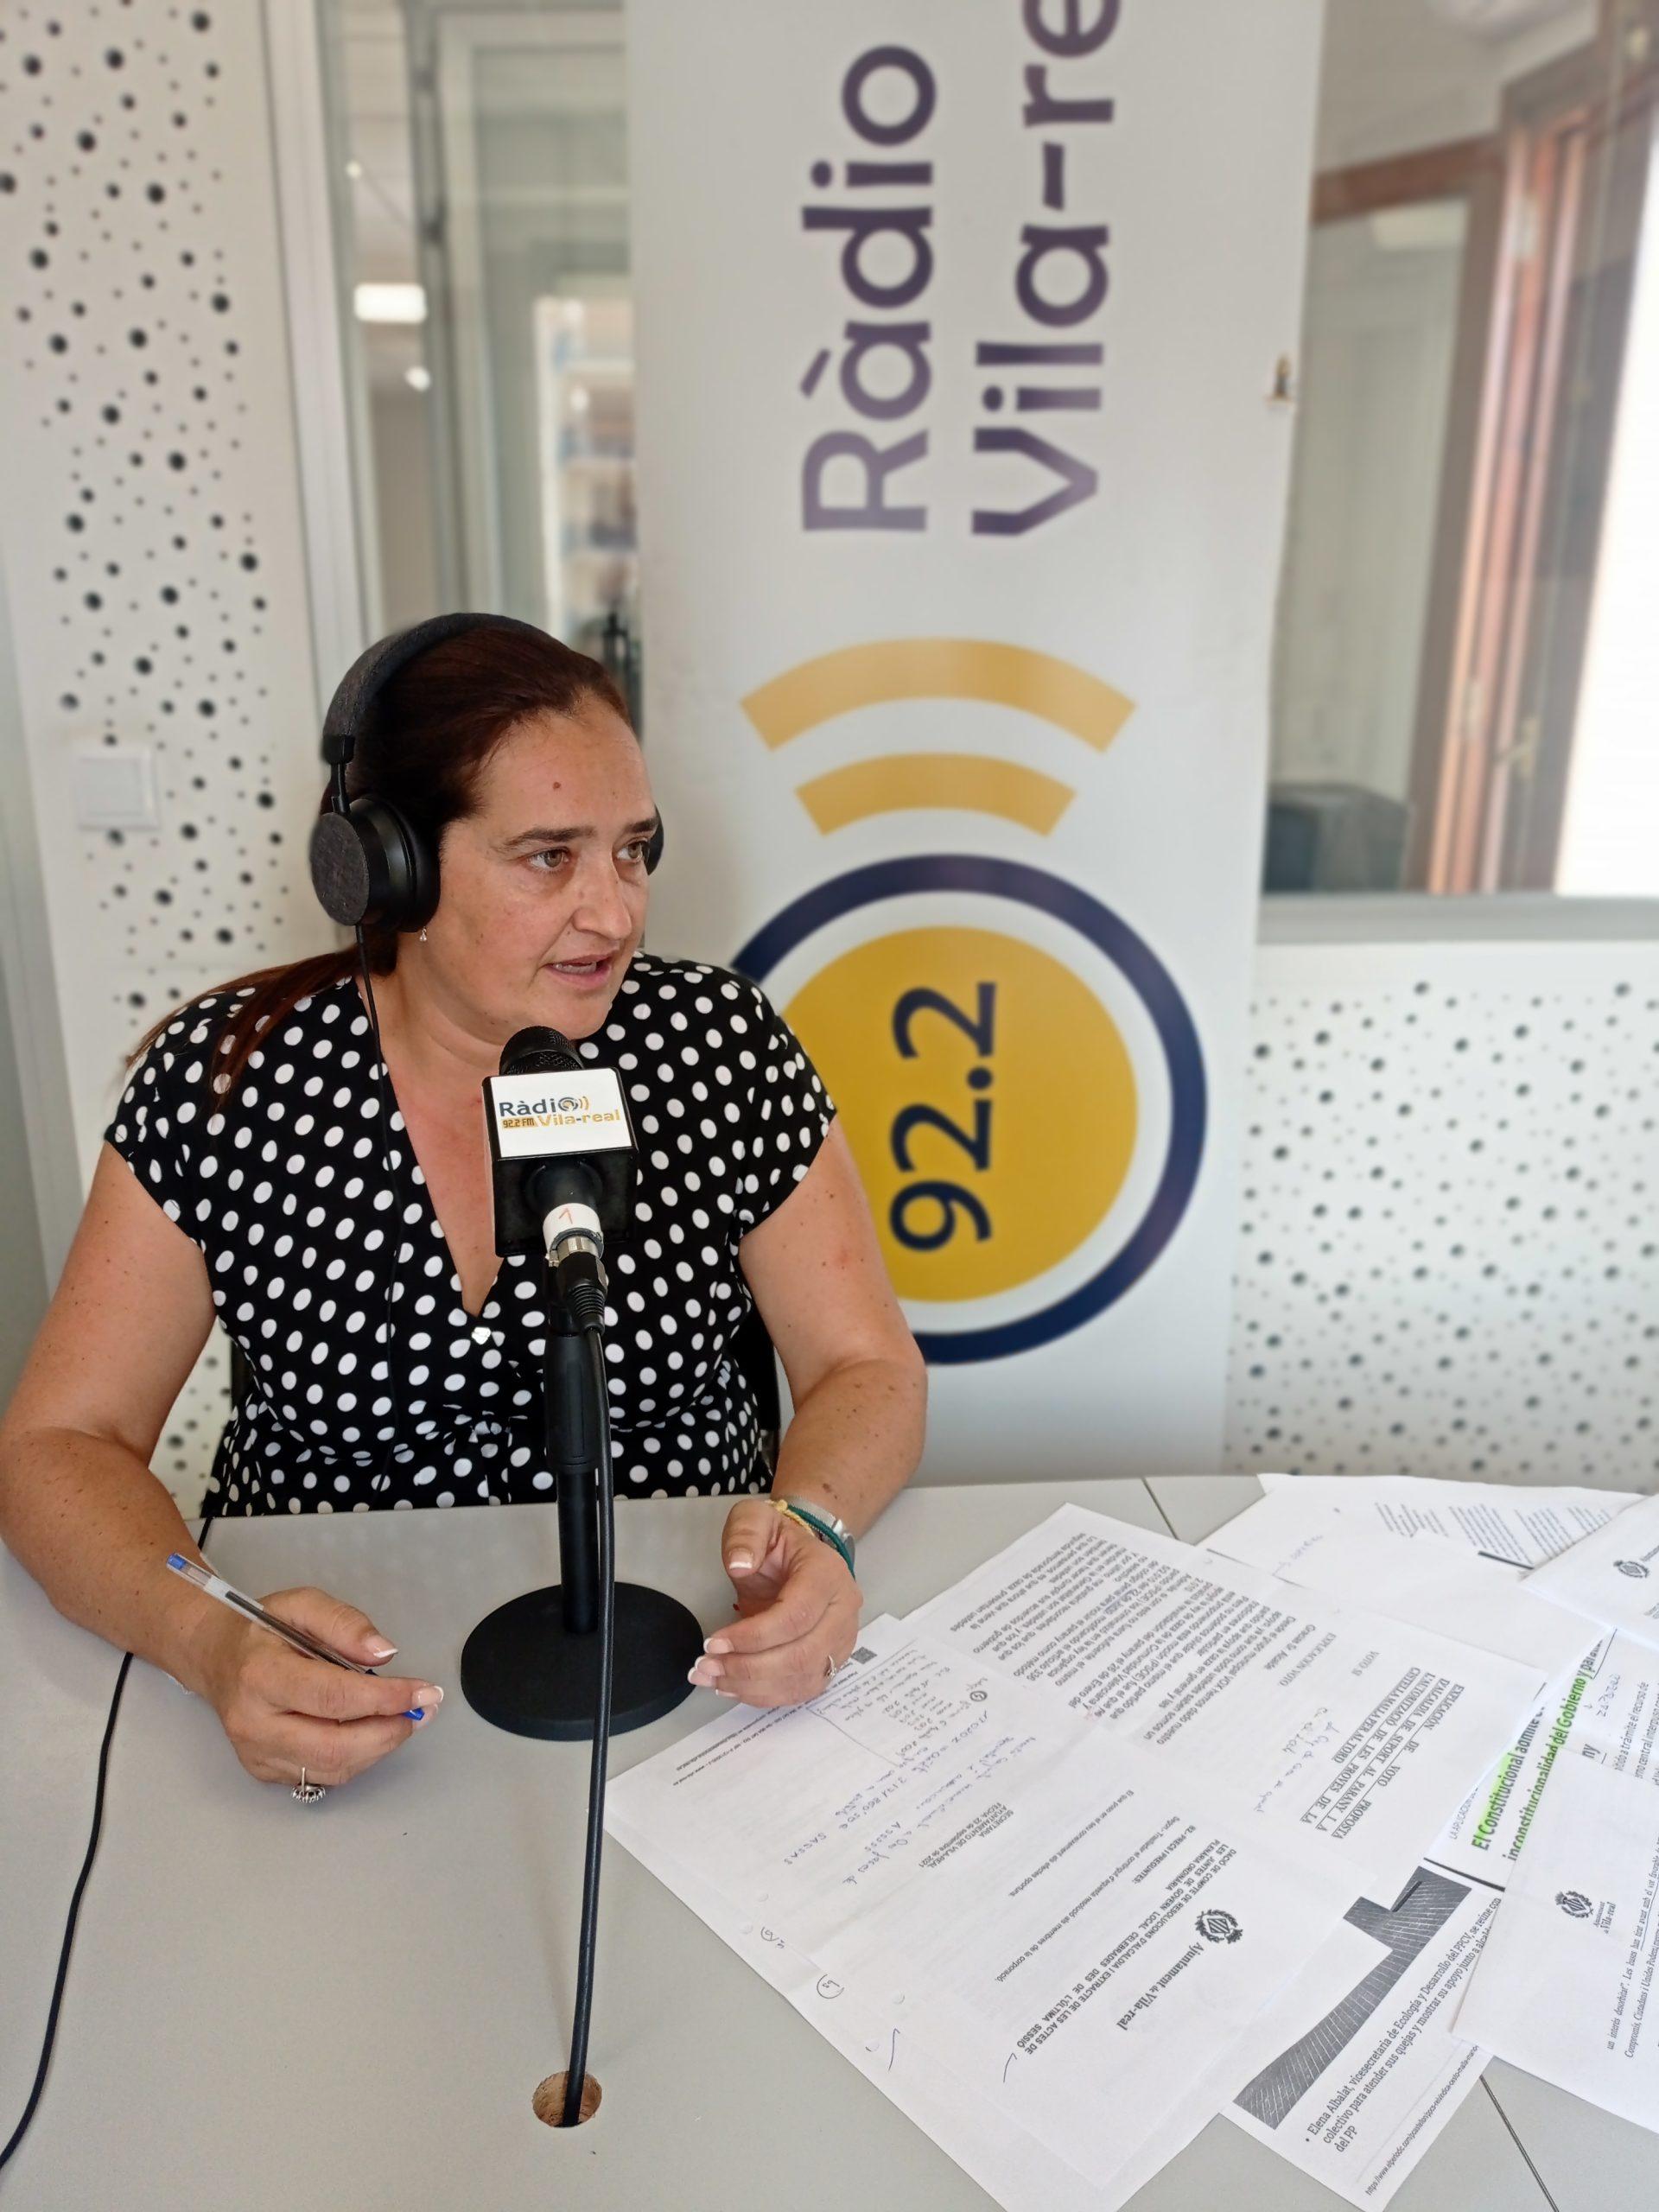 Entrevista a la portavoz de VOX de Vila-real, Irene Herrero